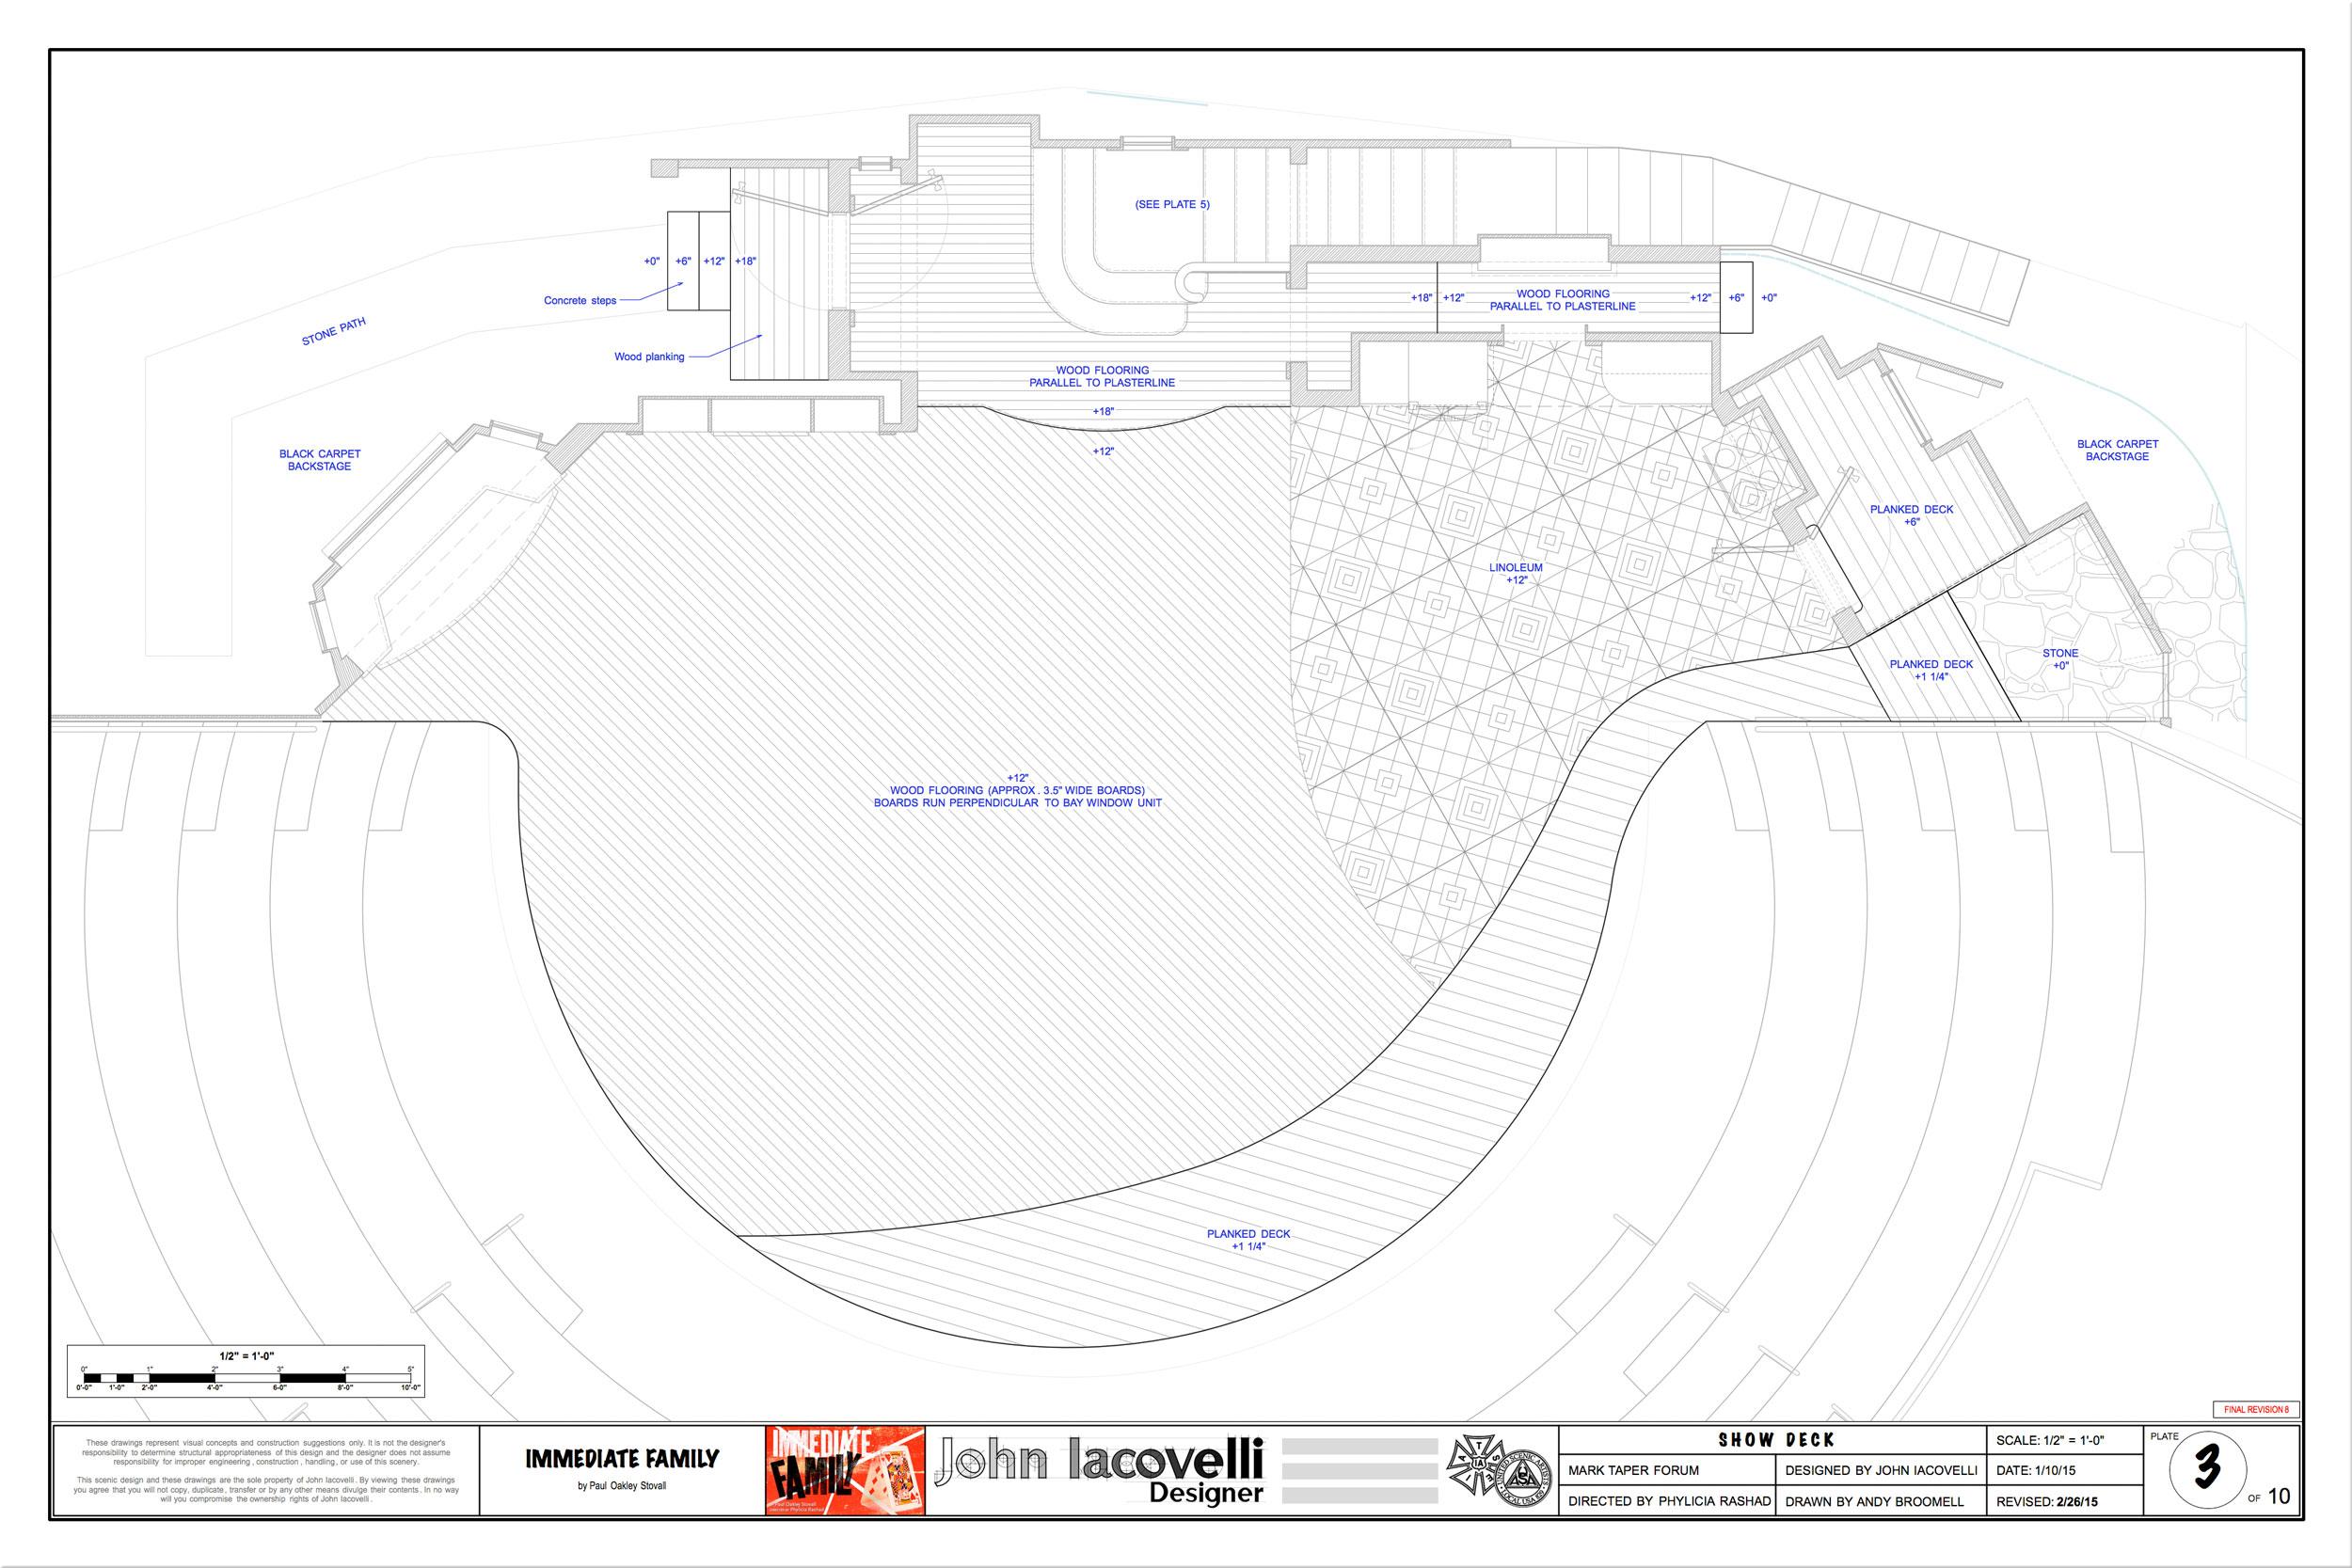 andy-broomell-scenic-design-drafting-immediate-family-3-vectorworks.jpg